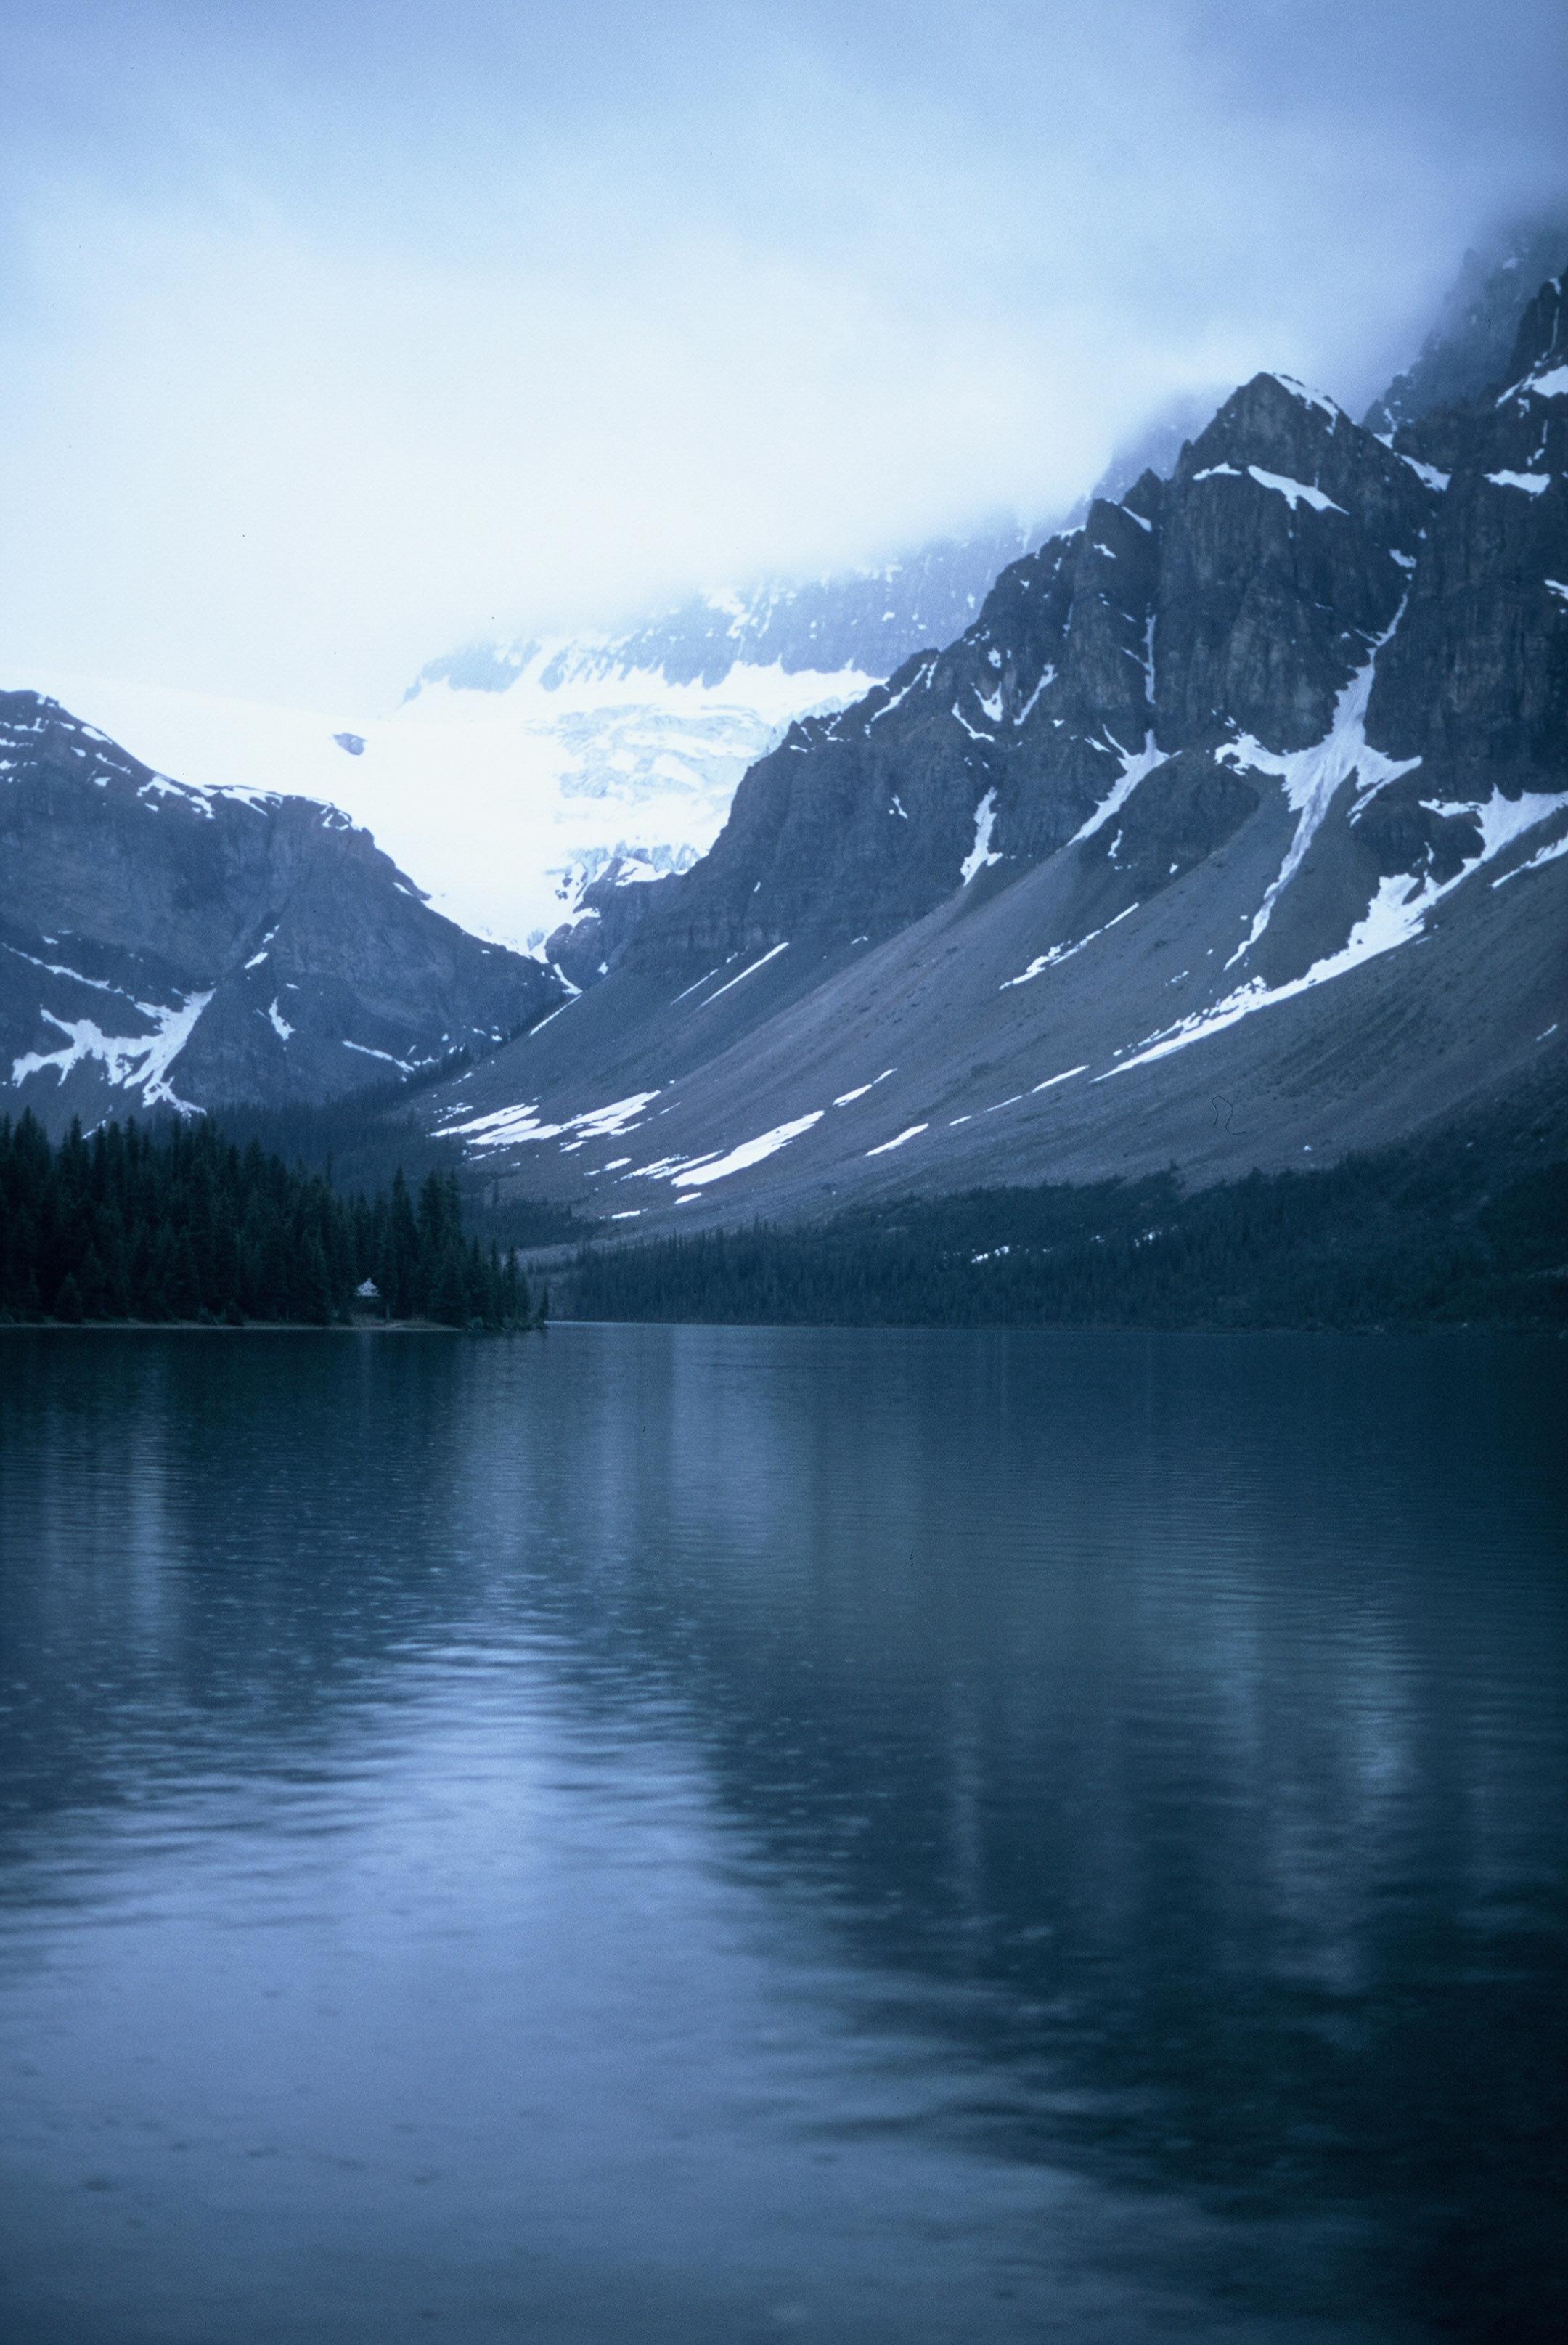 Canadian Rockies Banff Jasper Alberta Mountains 35mm SLR Canon A1 Sample Provia 100f Film Lake